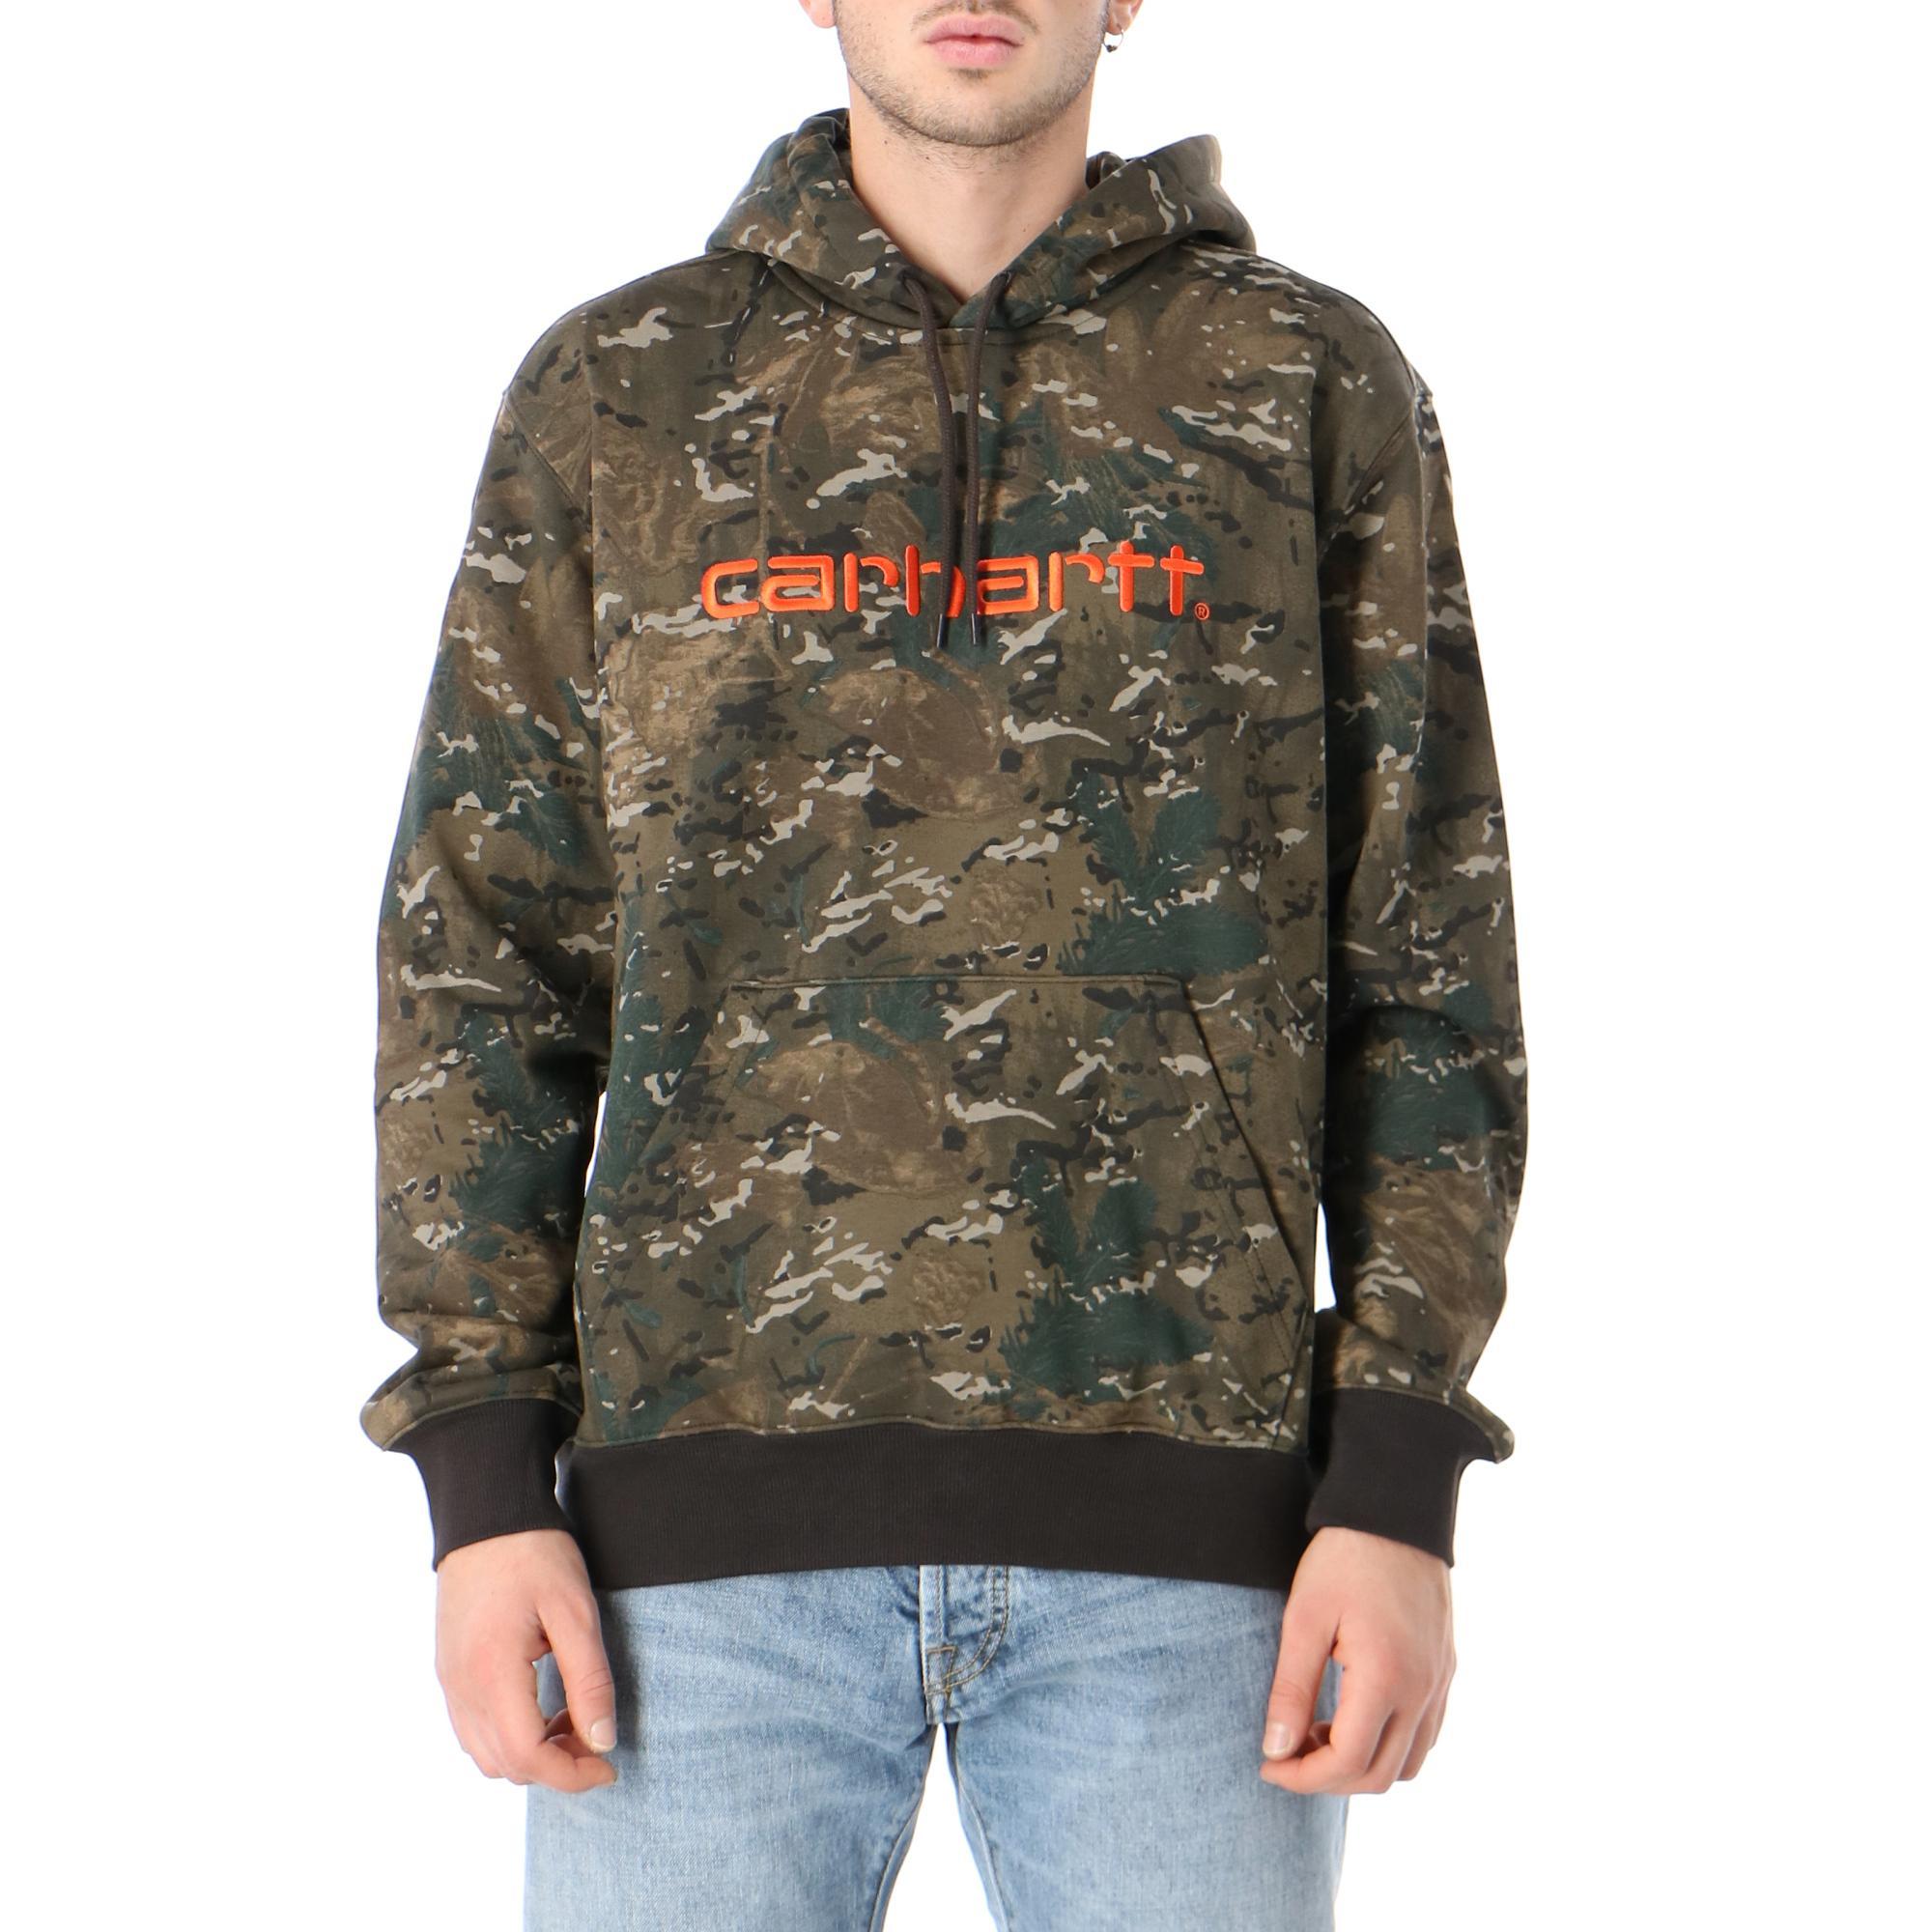 Carhartt Hooded Sweatshirt Camo combi safety orange